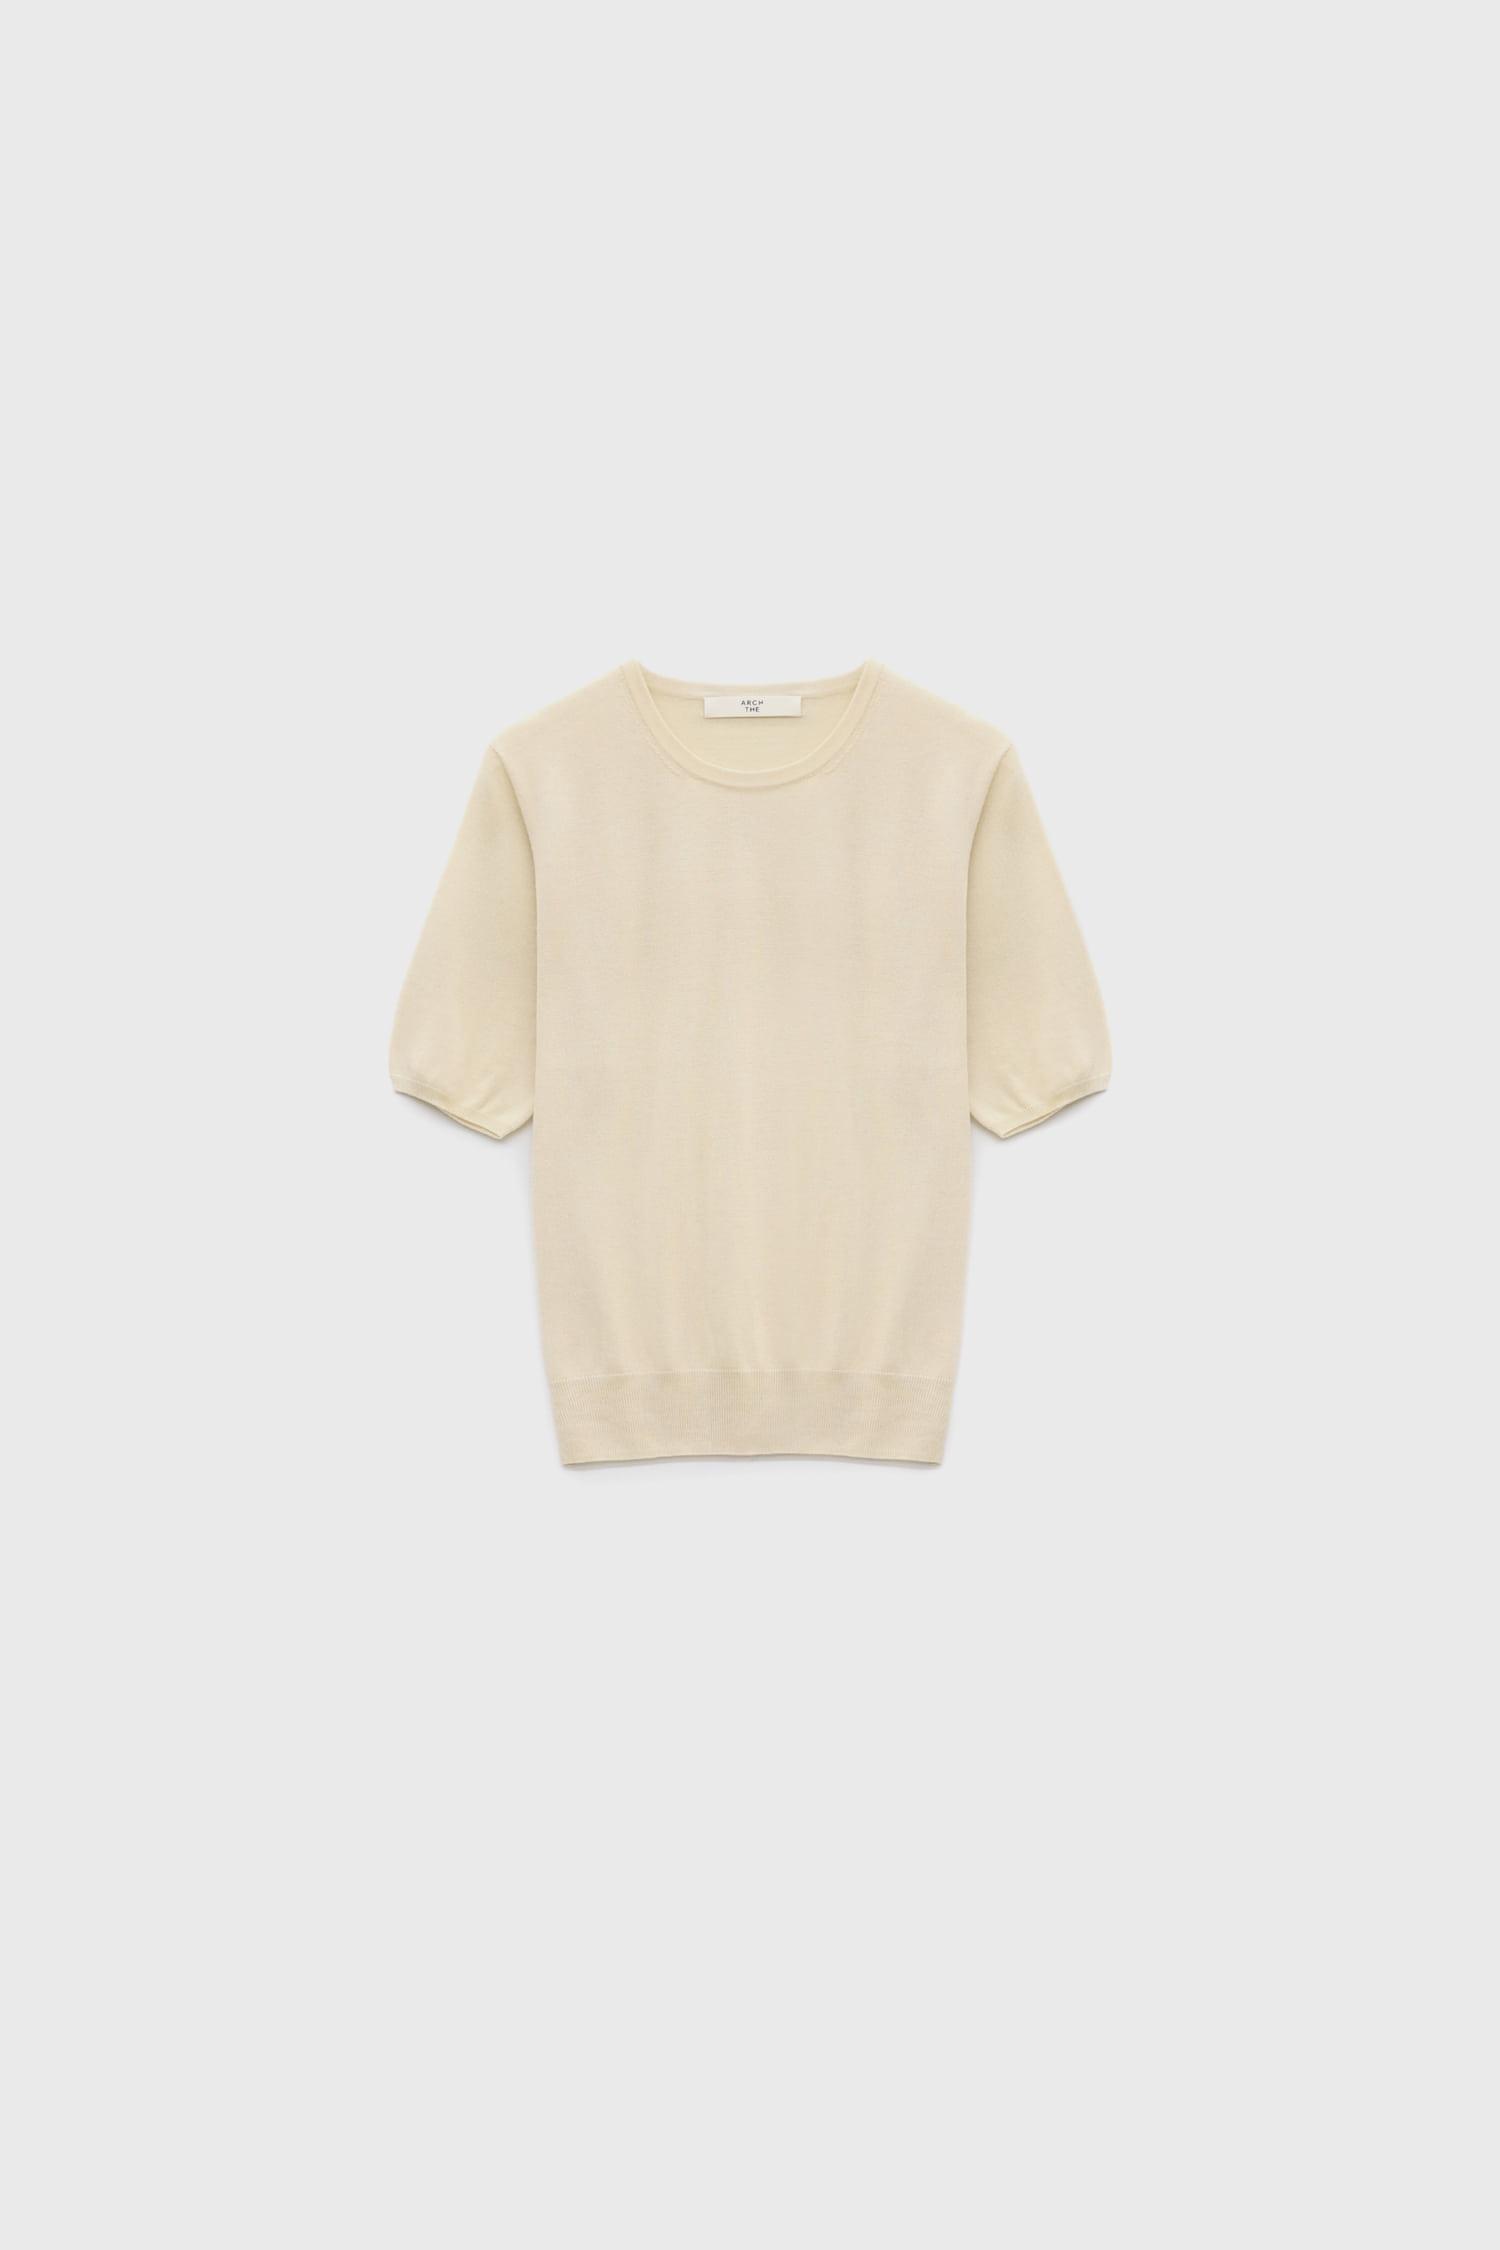 Rround neck short-sleeved sweater